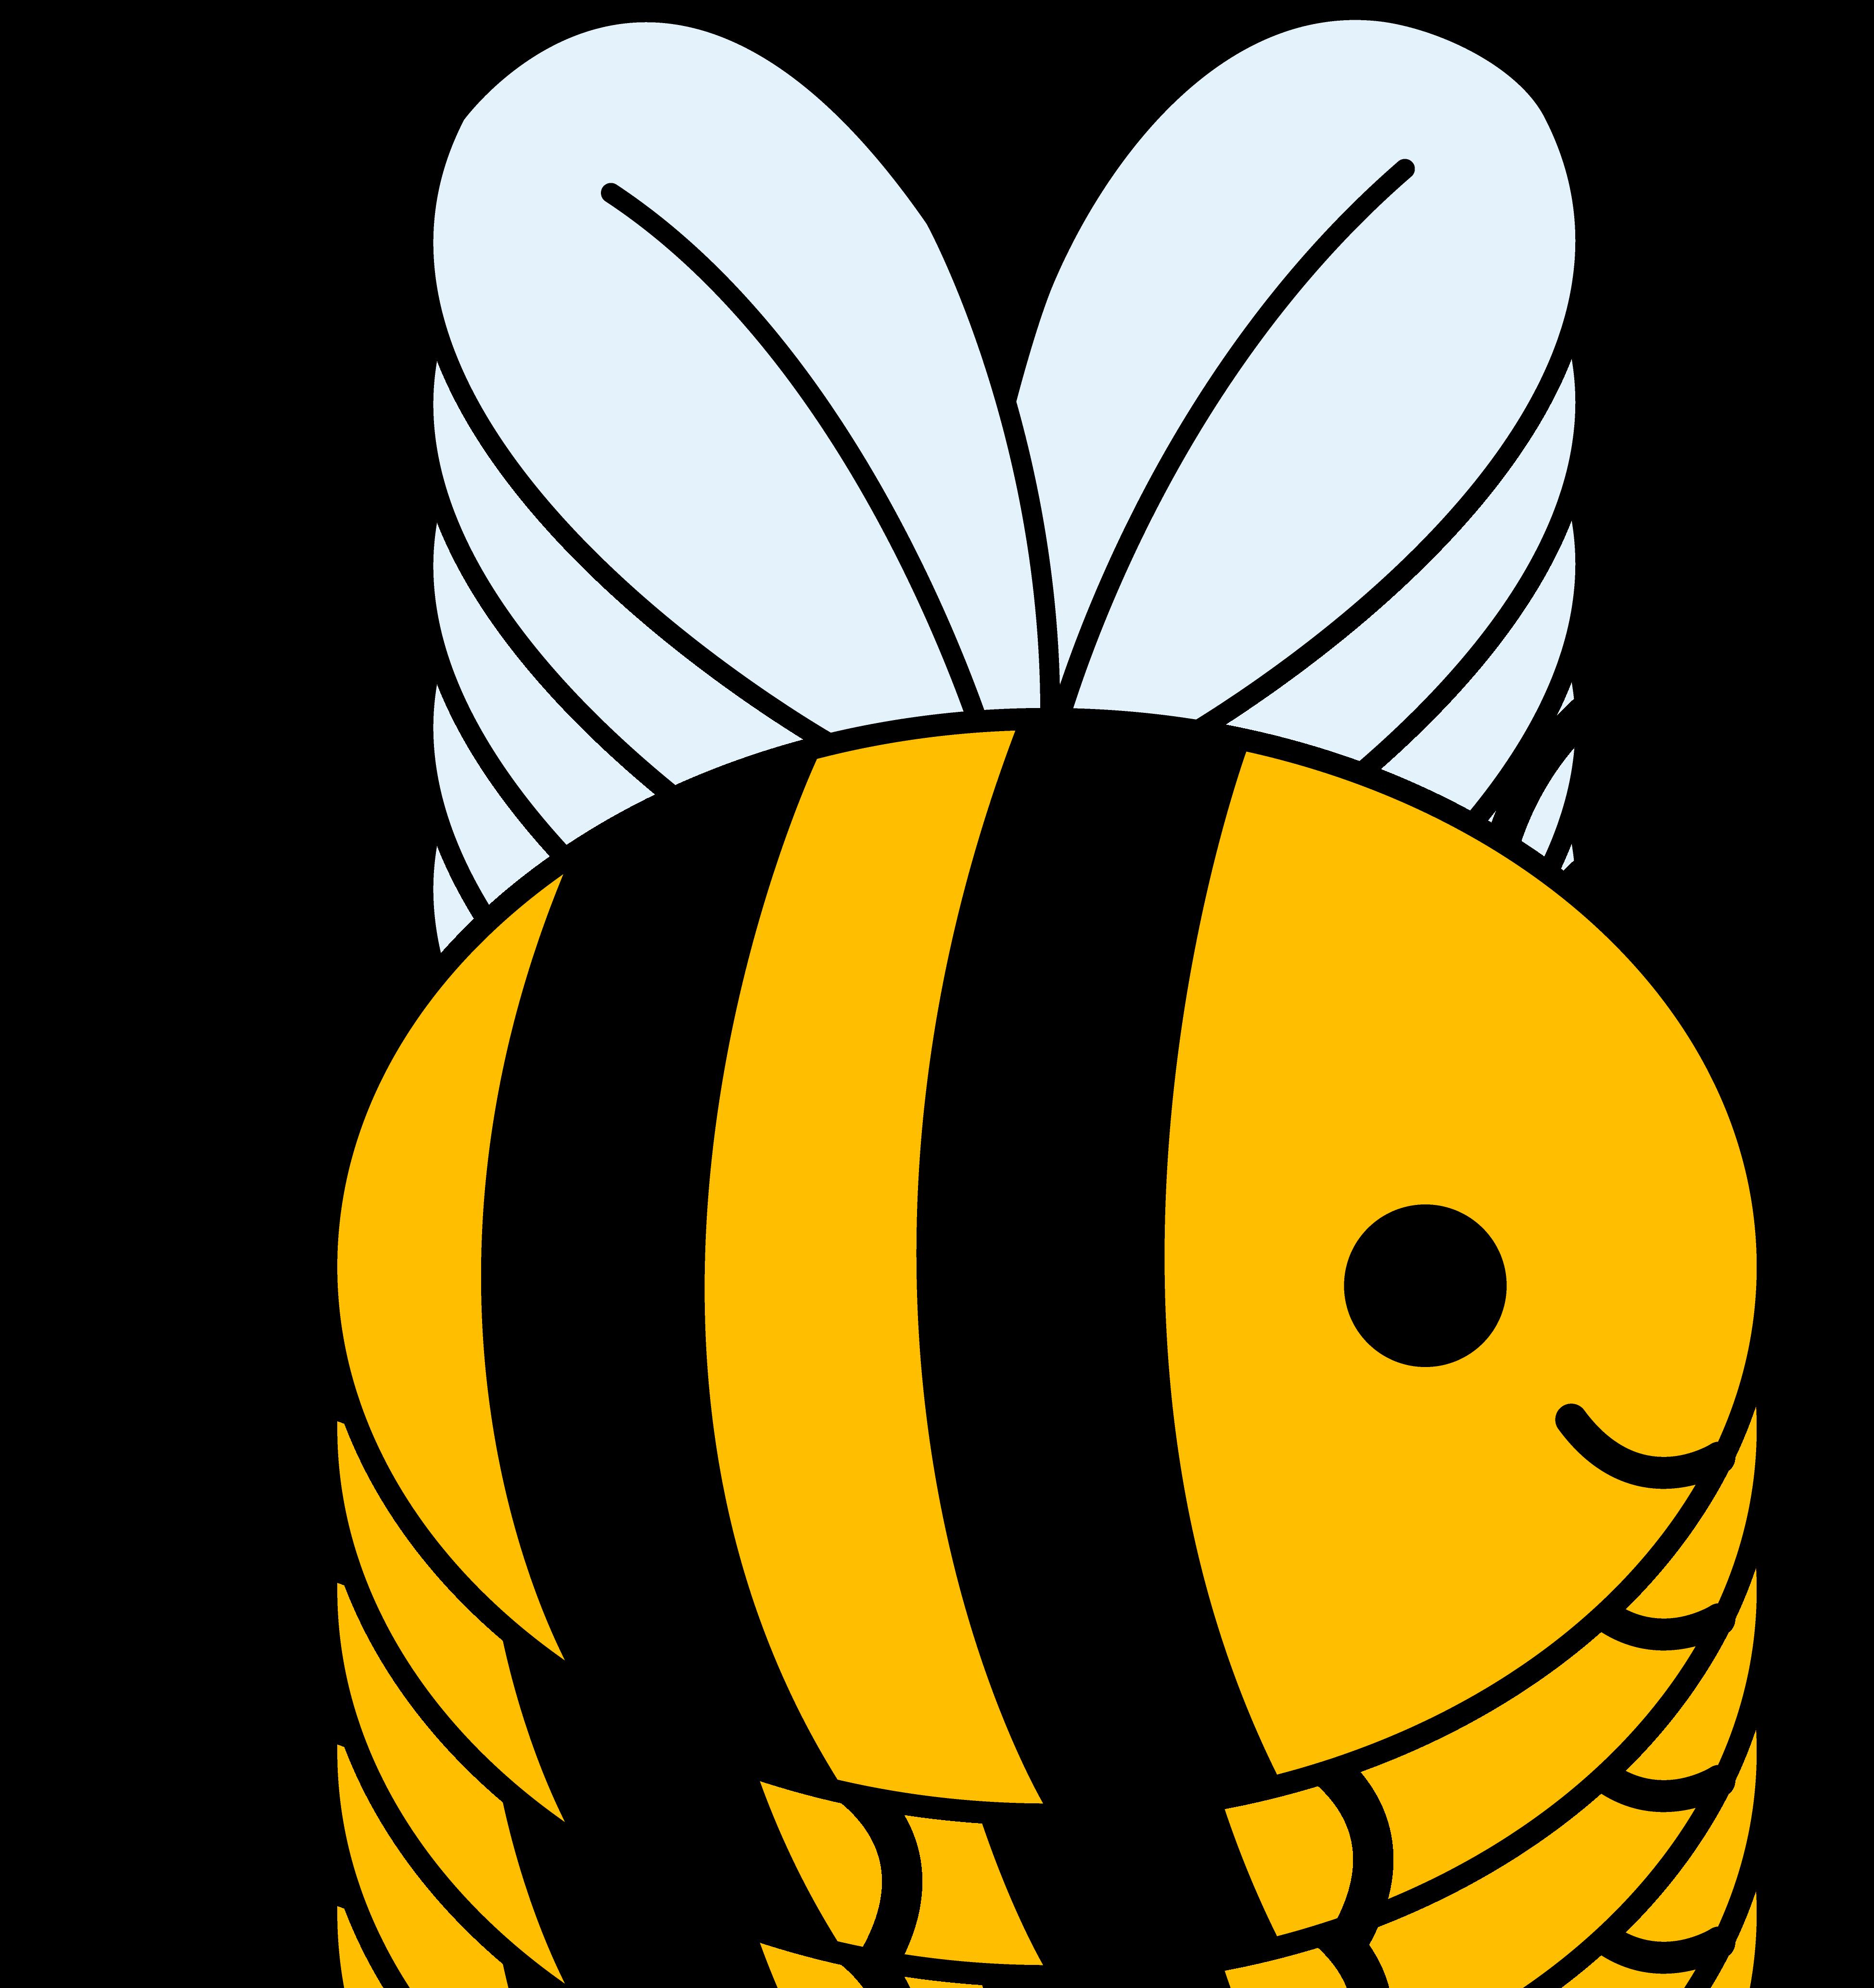 Bumblebee Bee Drawing Bumble Bee Cartoon Bee Pictures